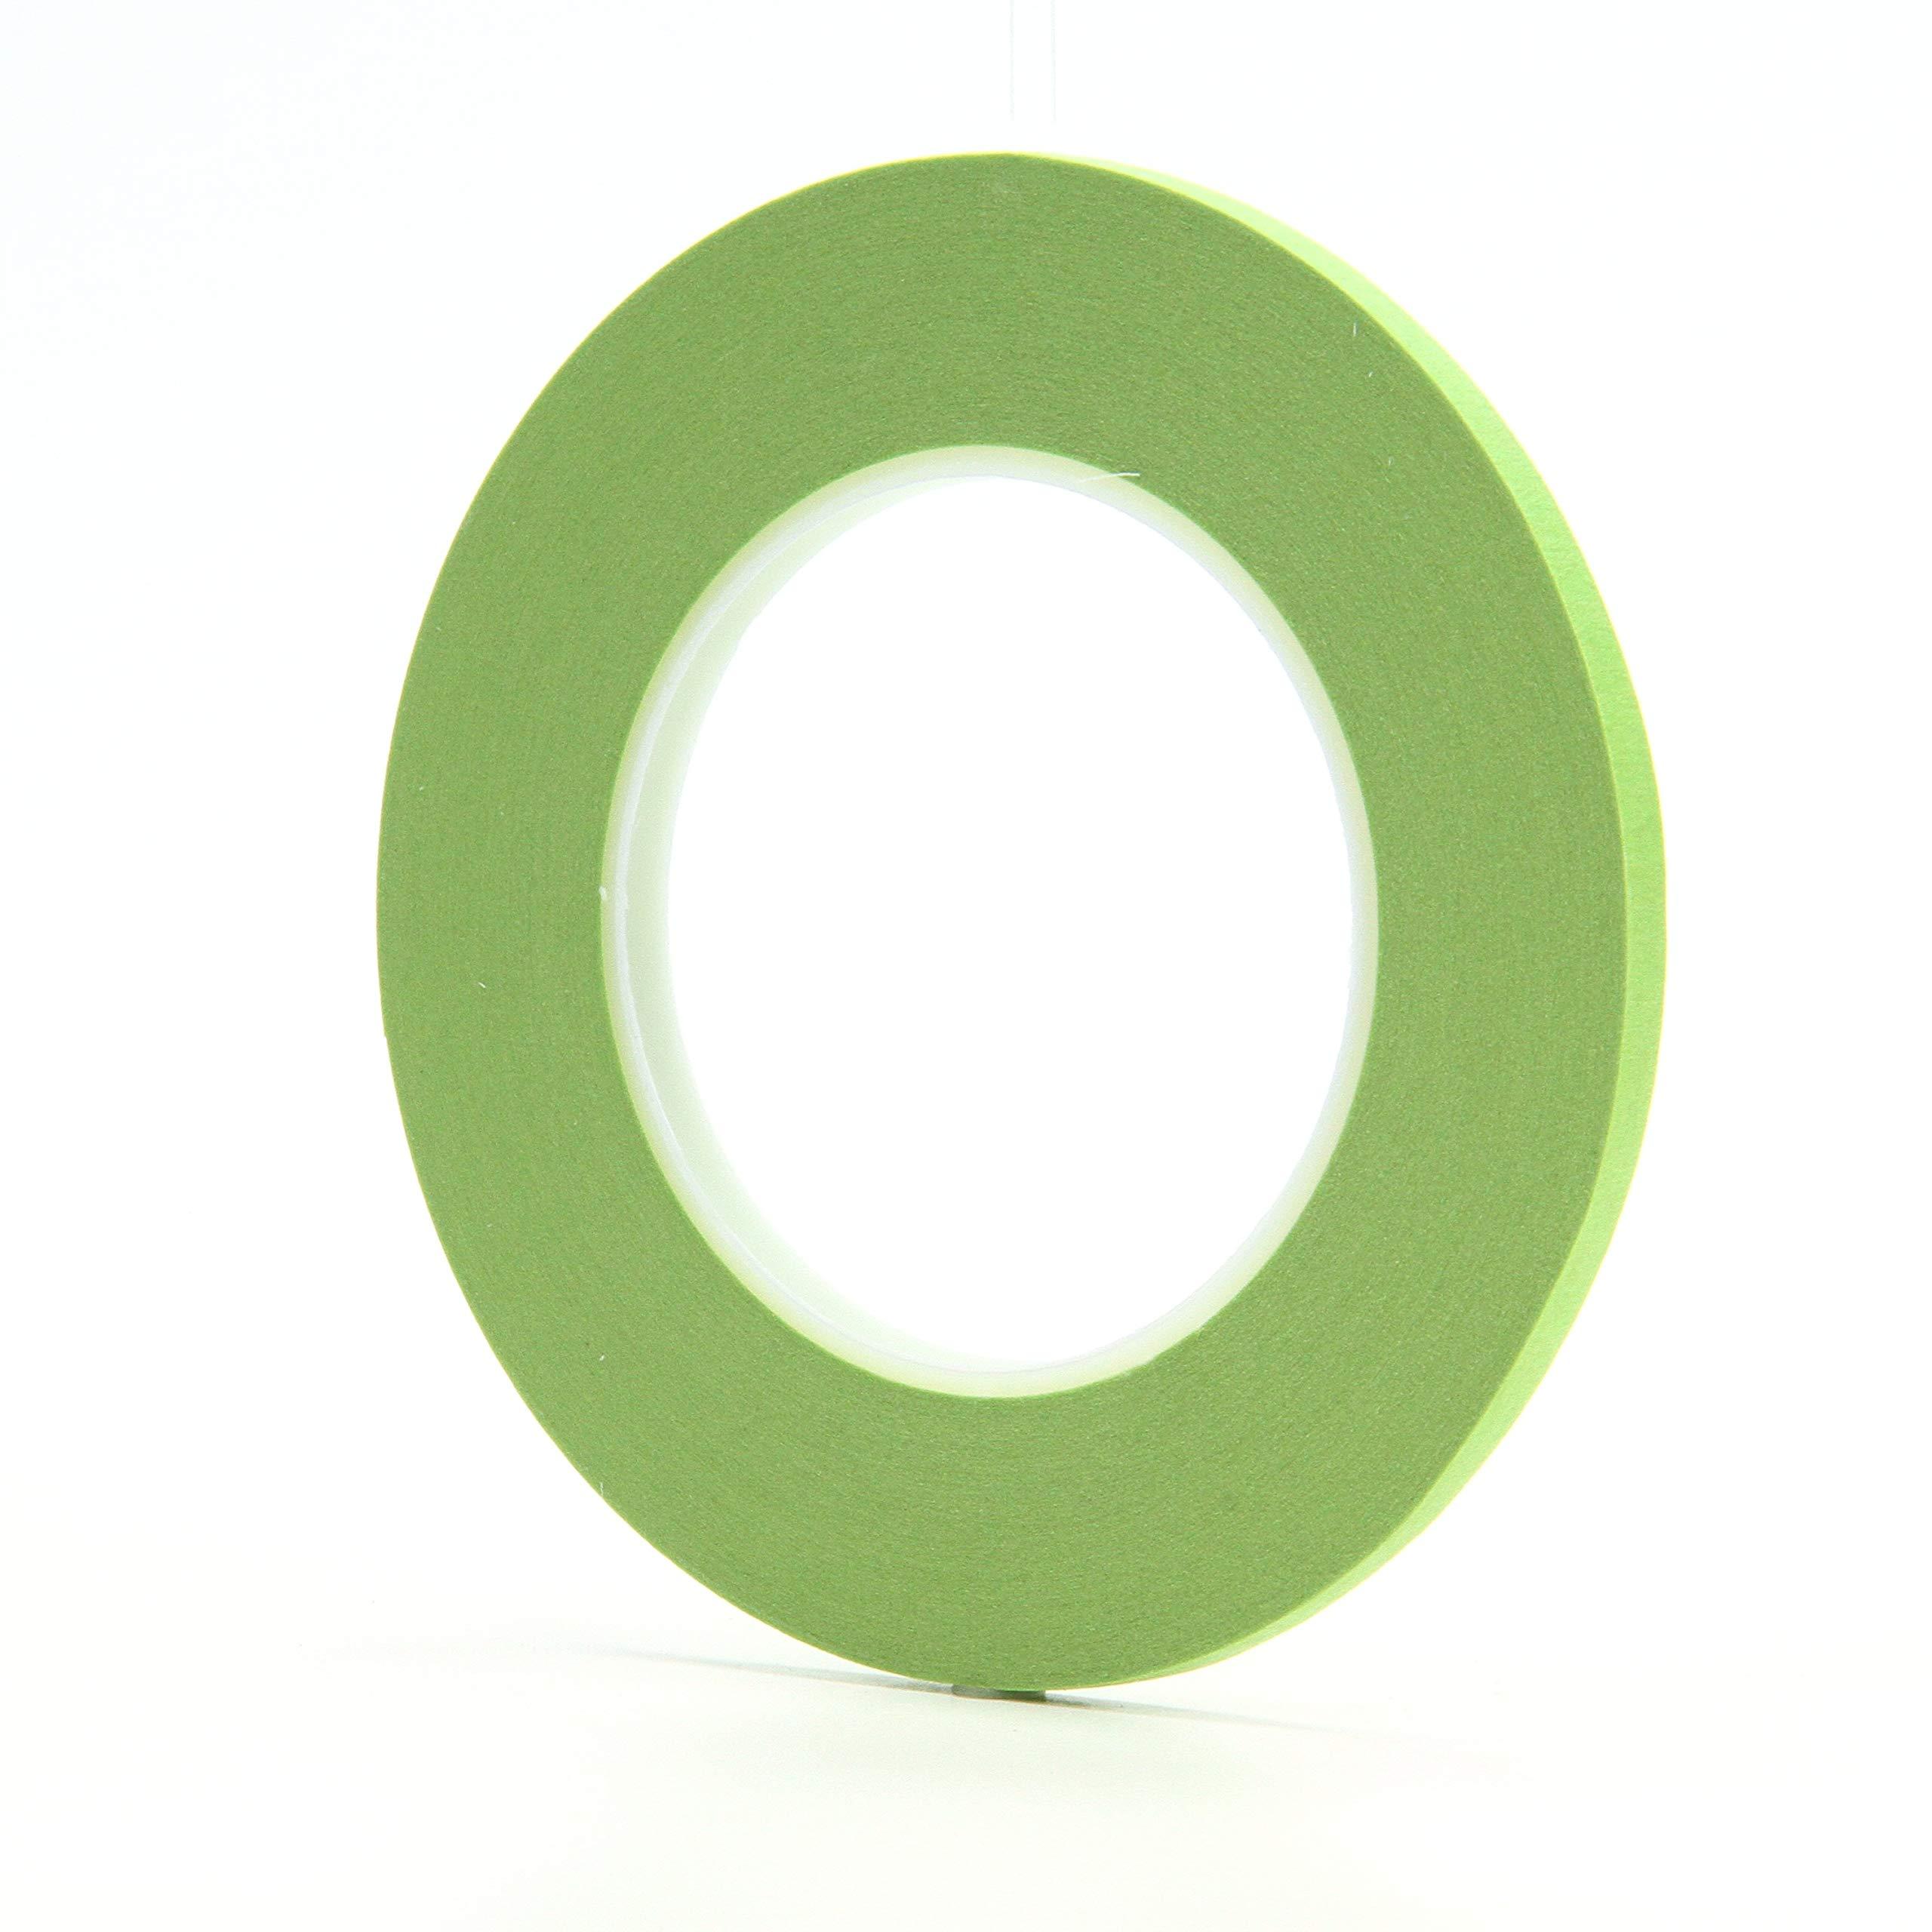 3M Green Scotch Performance Masking Tape 233+ 26340, 48 mm x 55 m 3 Pack